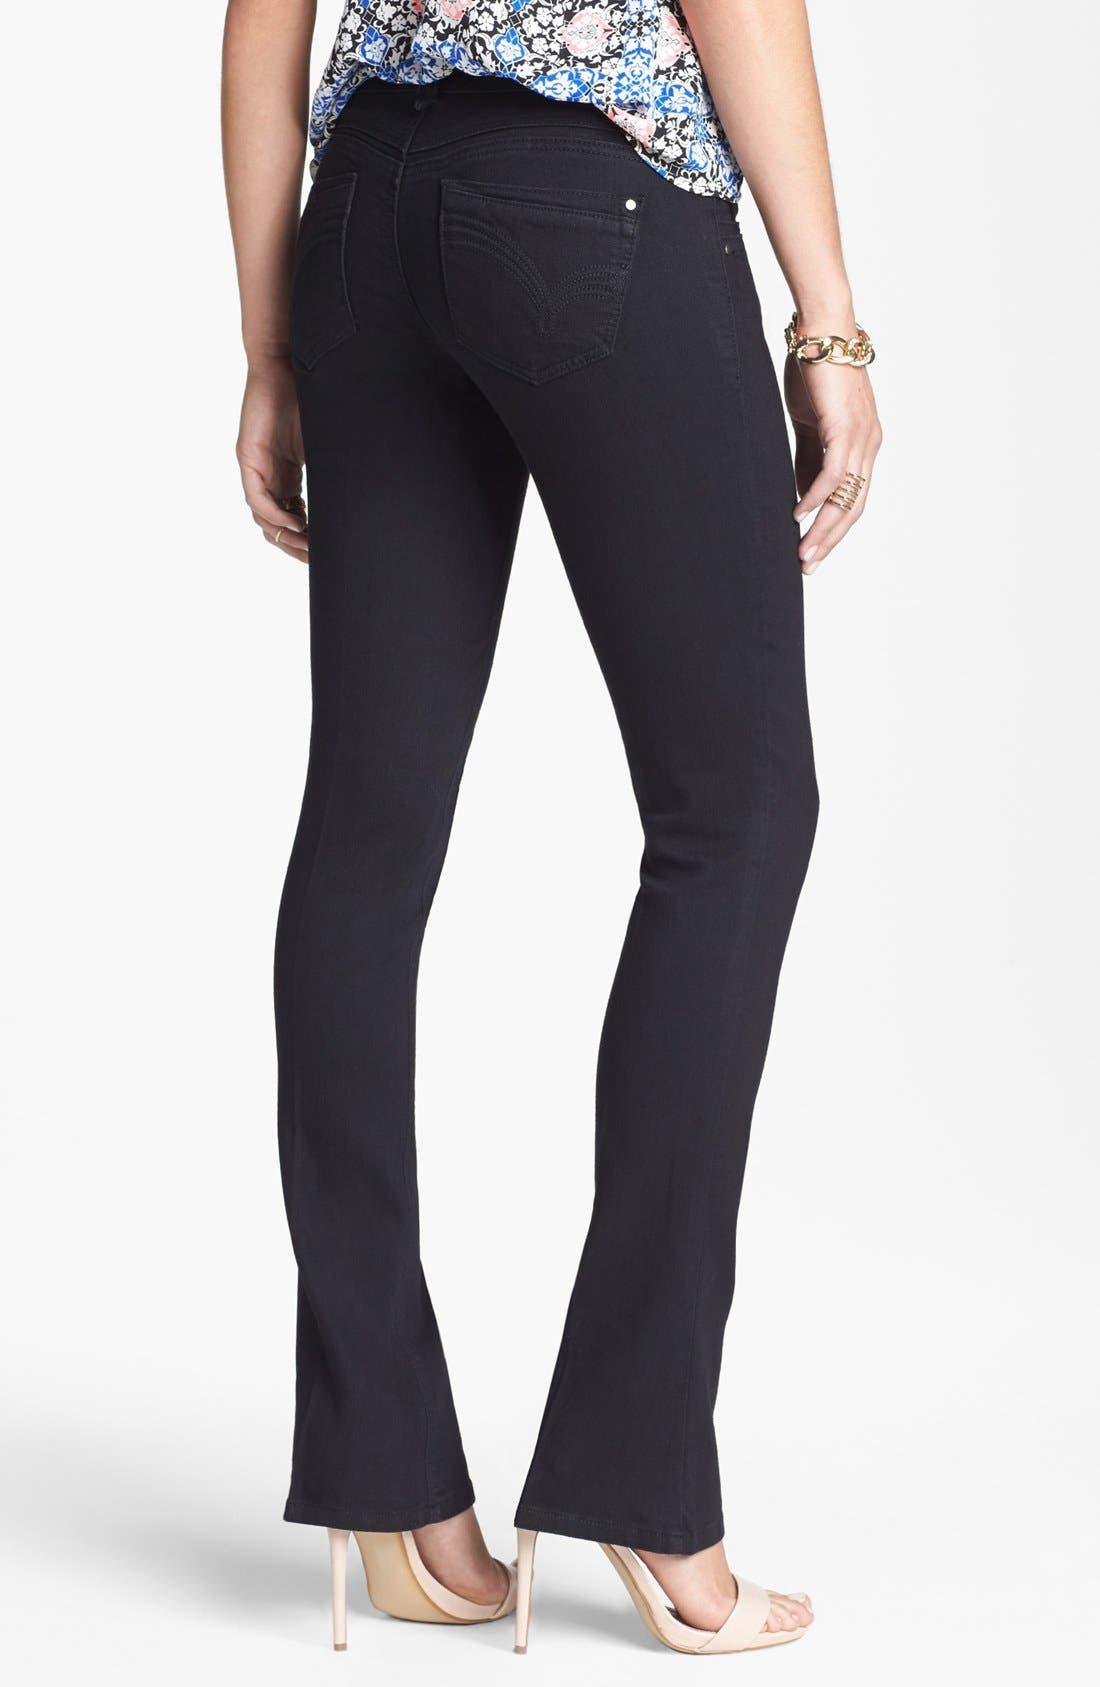 Alternate Image 2  - Jolt Stretch Bootcut Jeans (Black) (Juniors) (Online Only)